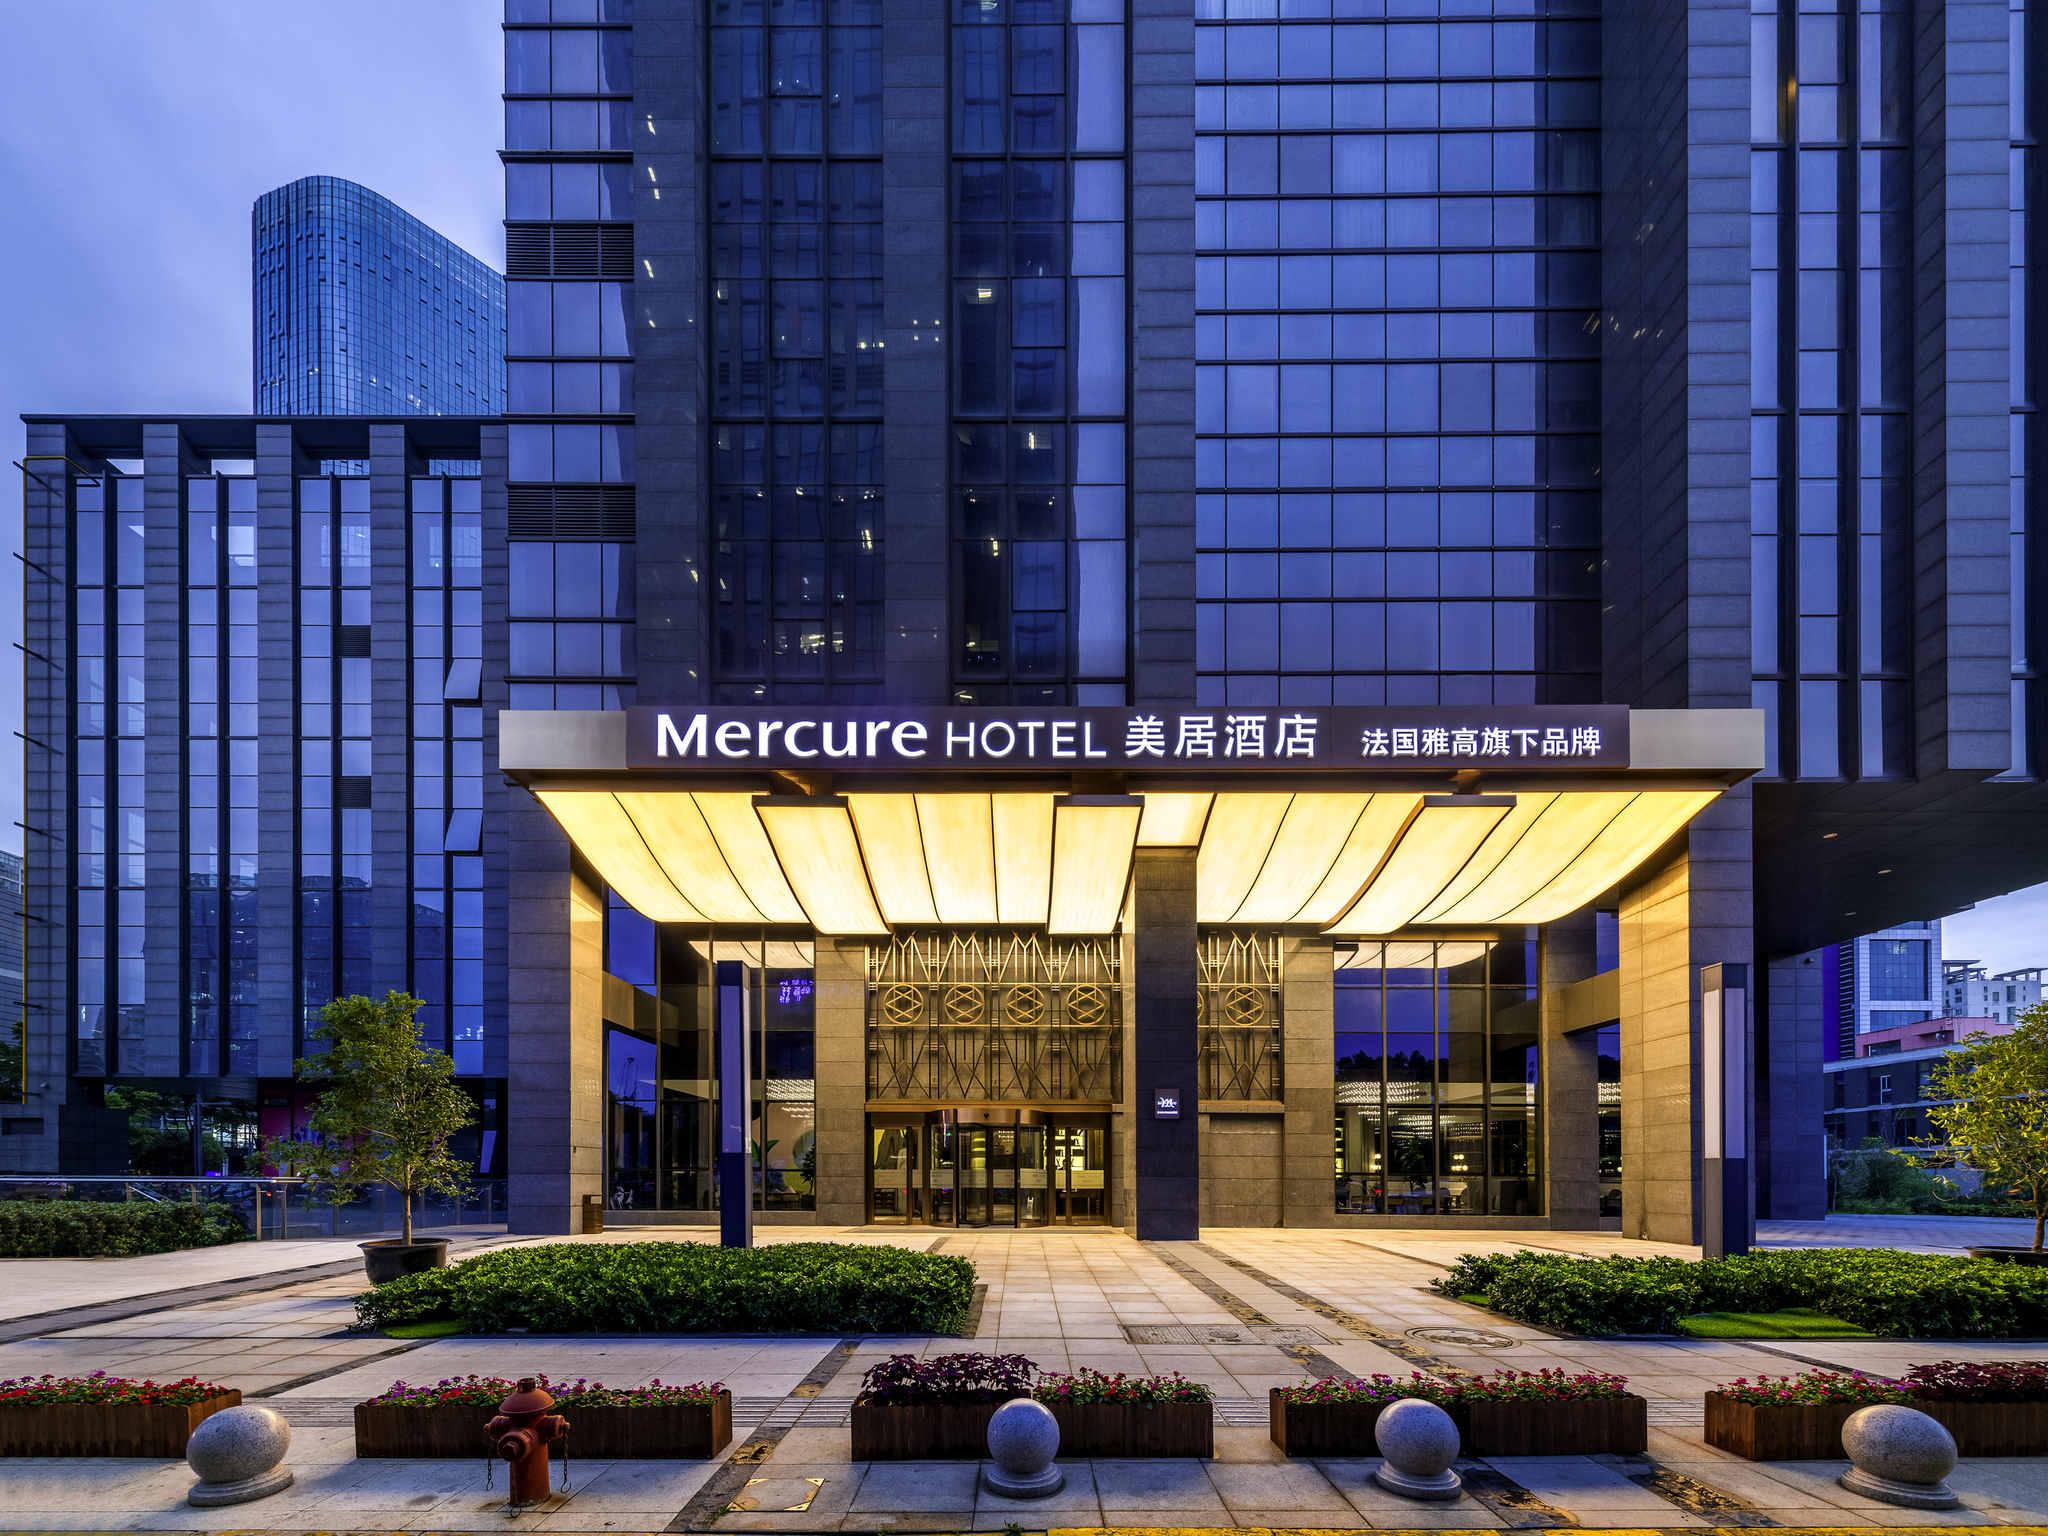 Otel – Mercure Suzhou Jinji Lake (Opening August 2018)